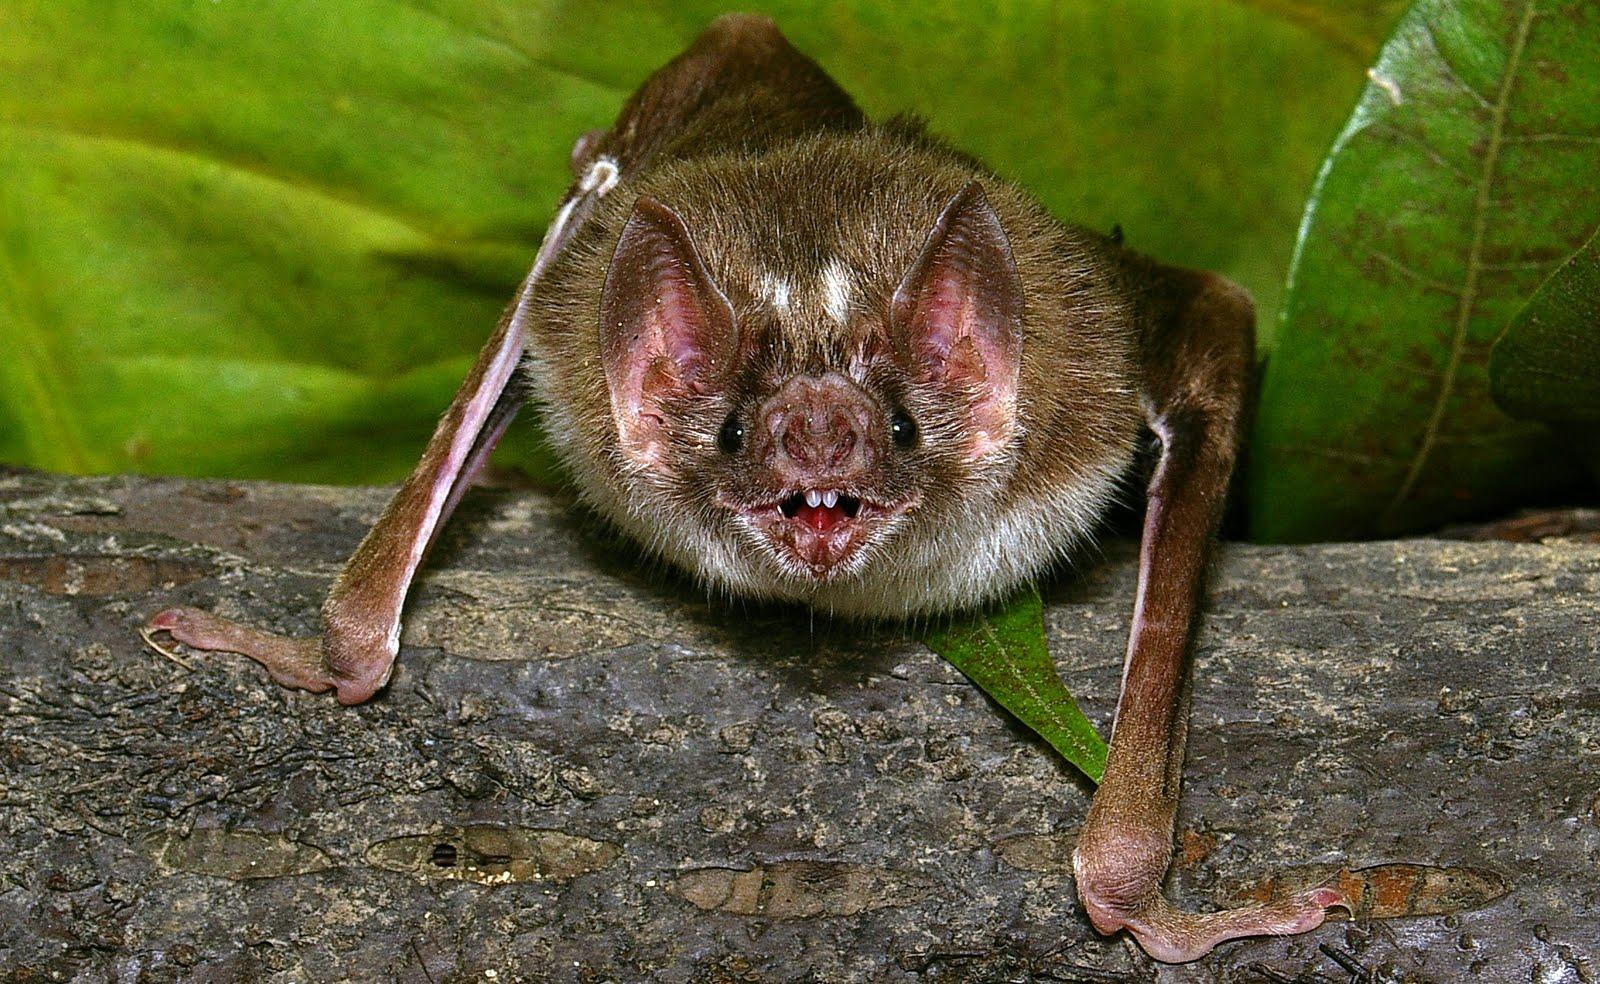 Araucaria comment les vampires rep rent ils leurs proies - Comment les cambrioleurs reperent ...